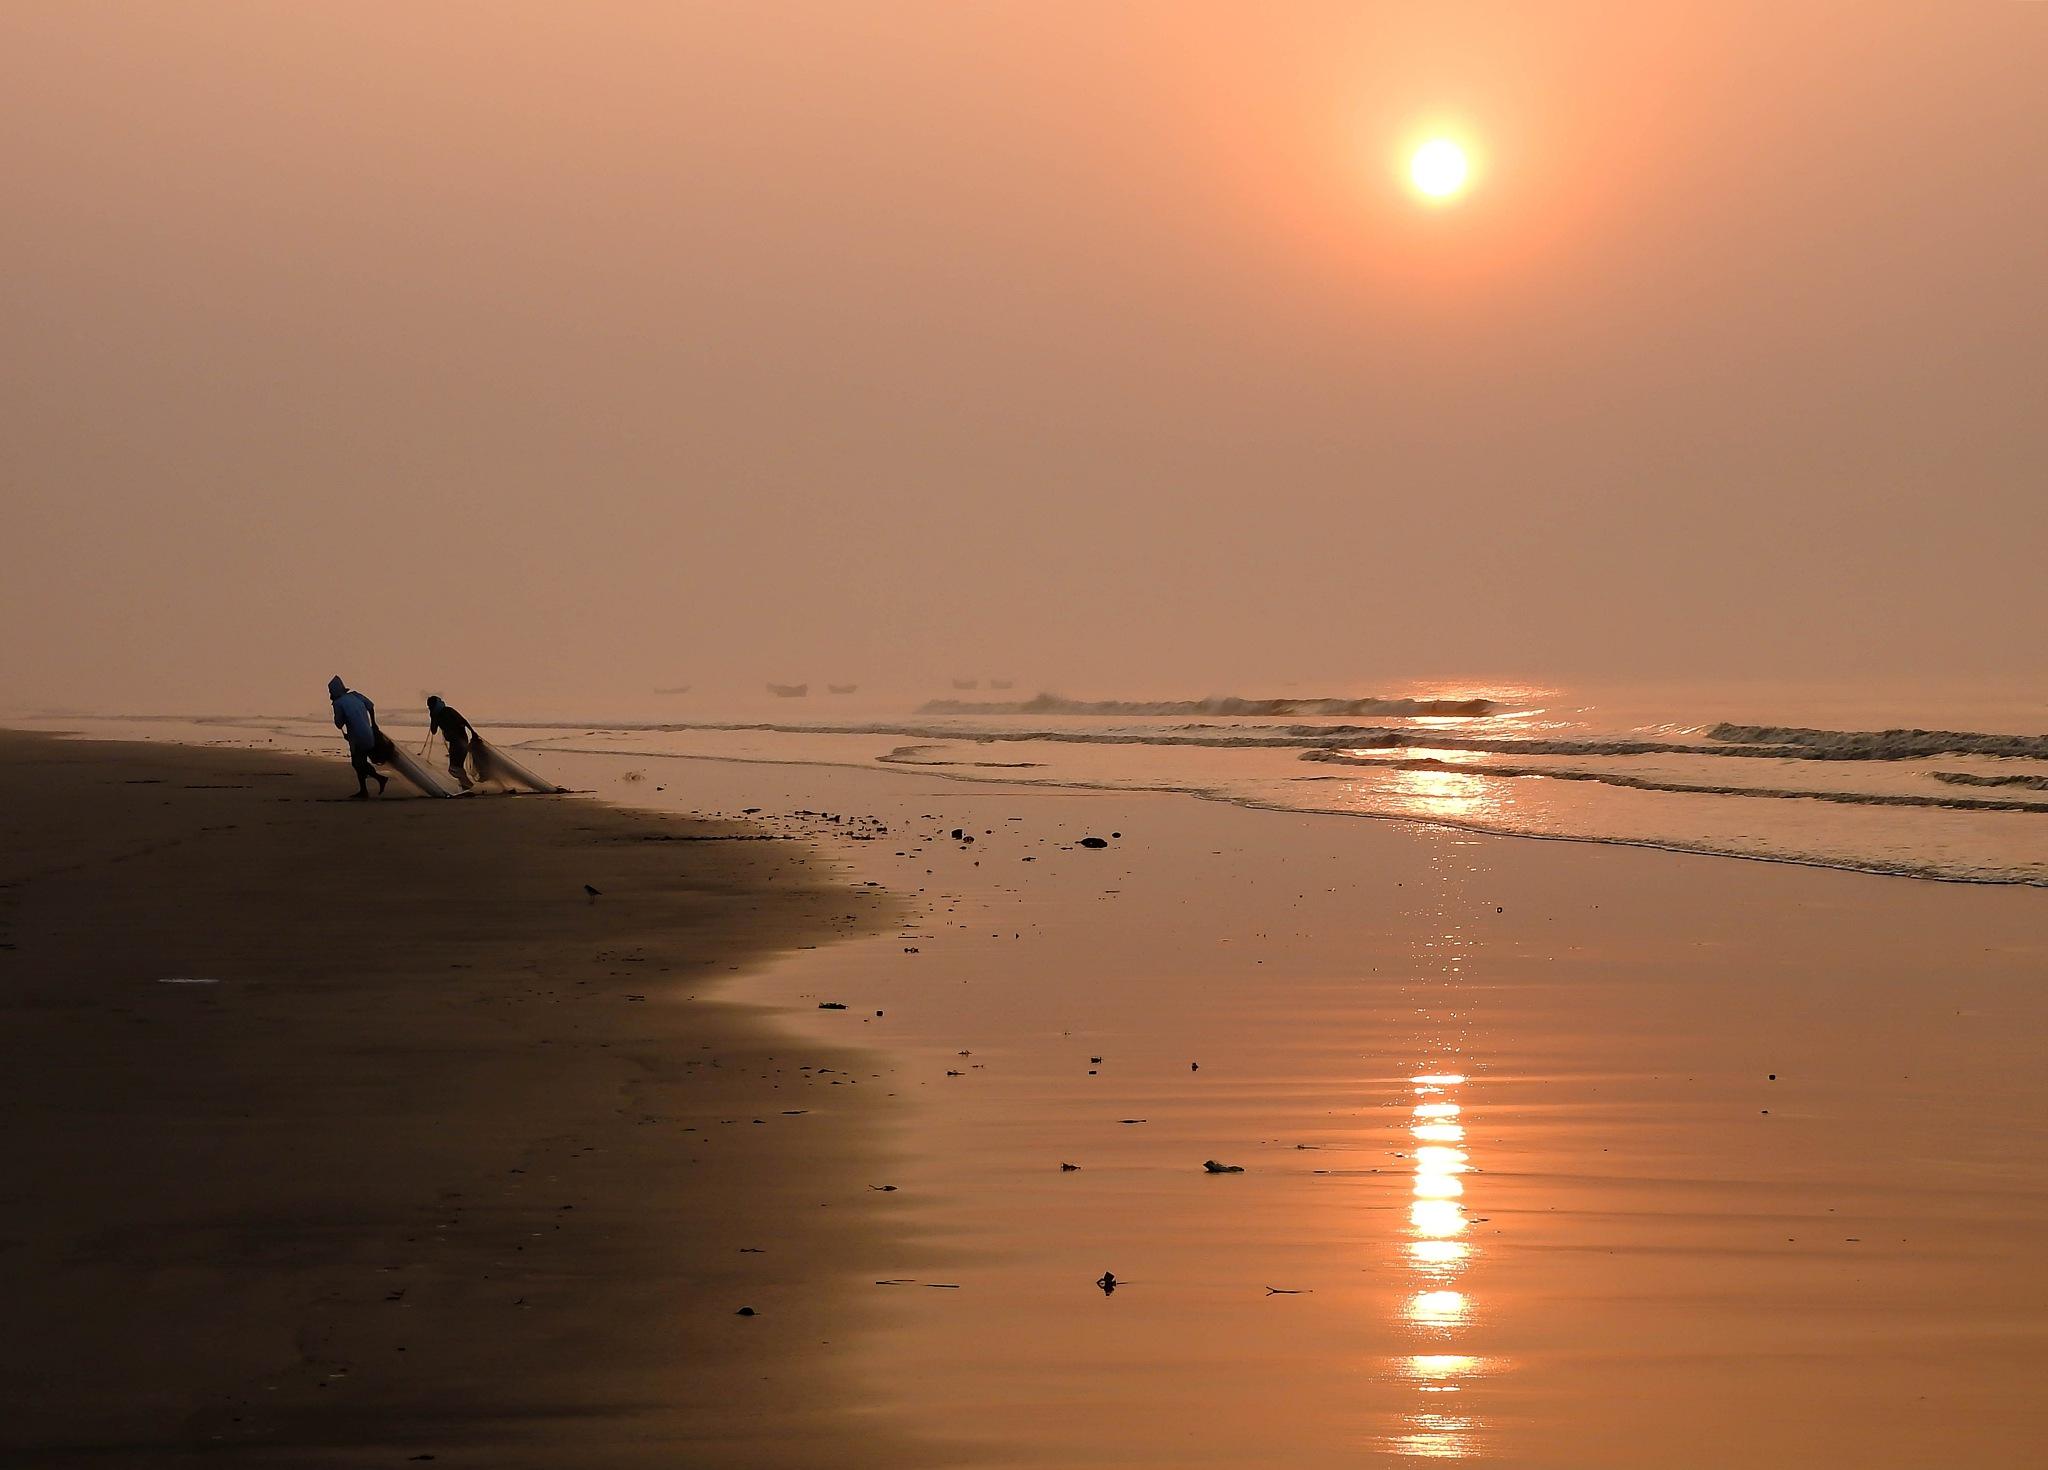 Fishing by Ajit Kumar Majhi